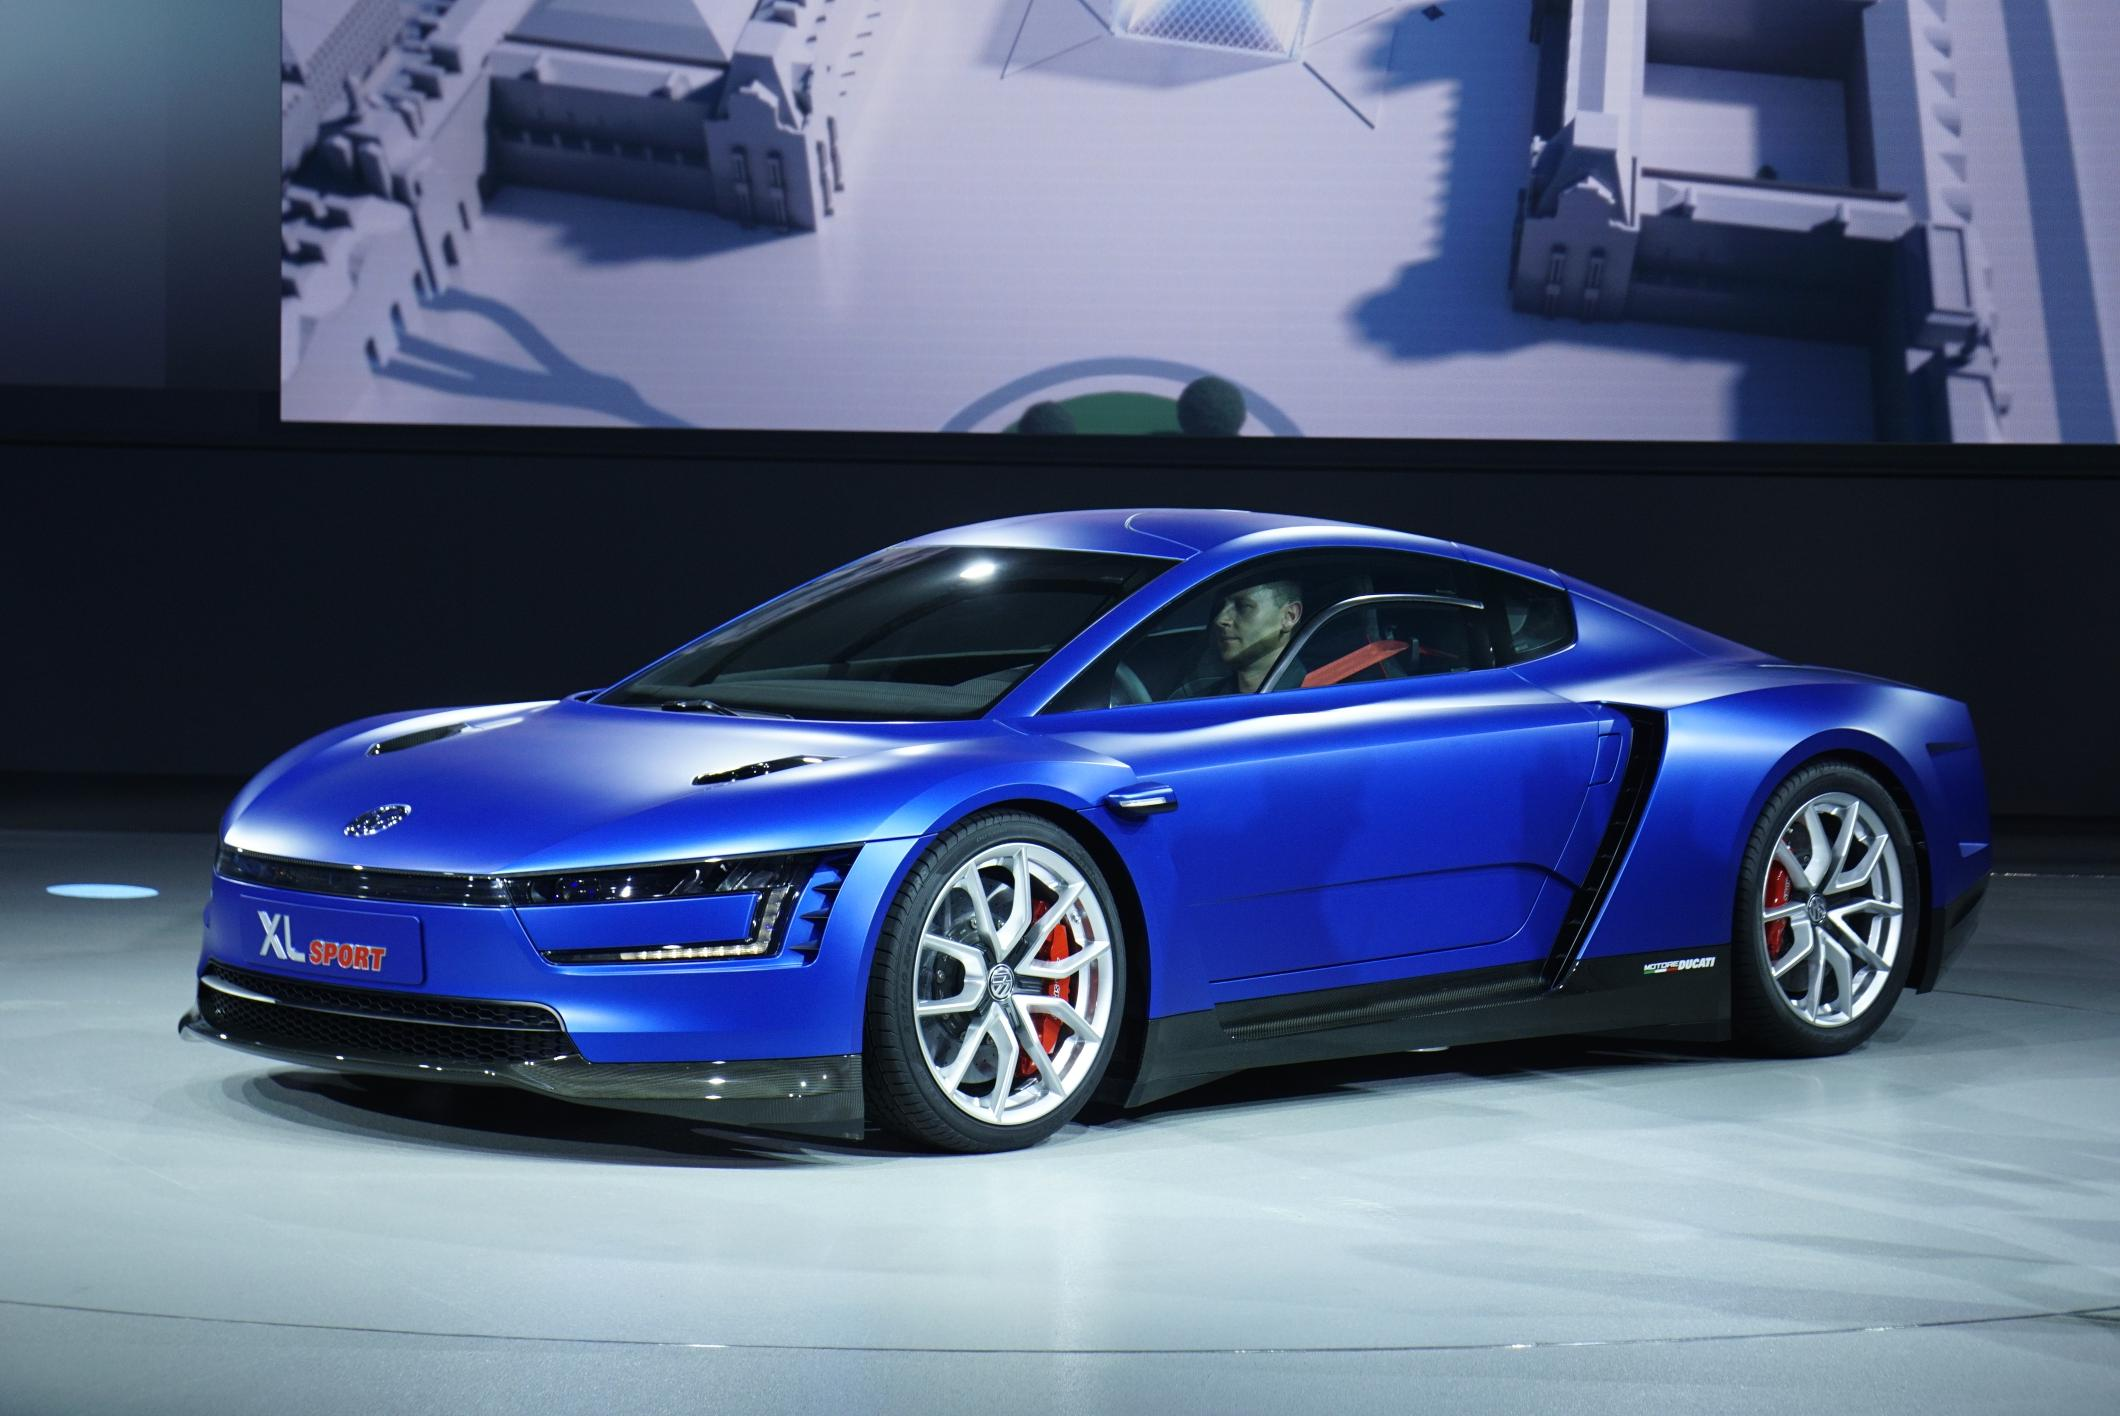 Volkswagen Xl Sport Live Photos 2014 Paris Motor Show